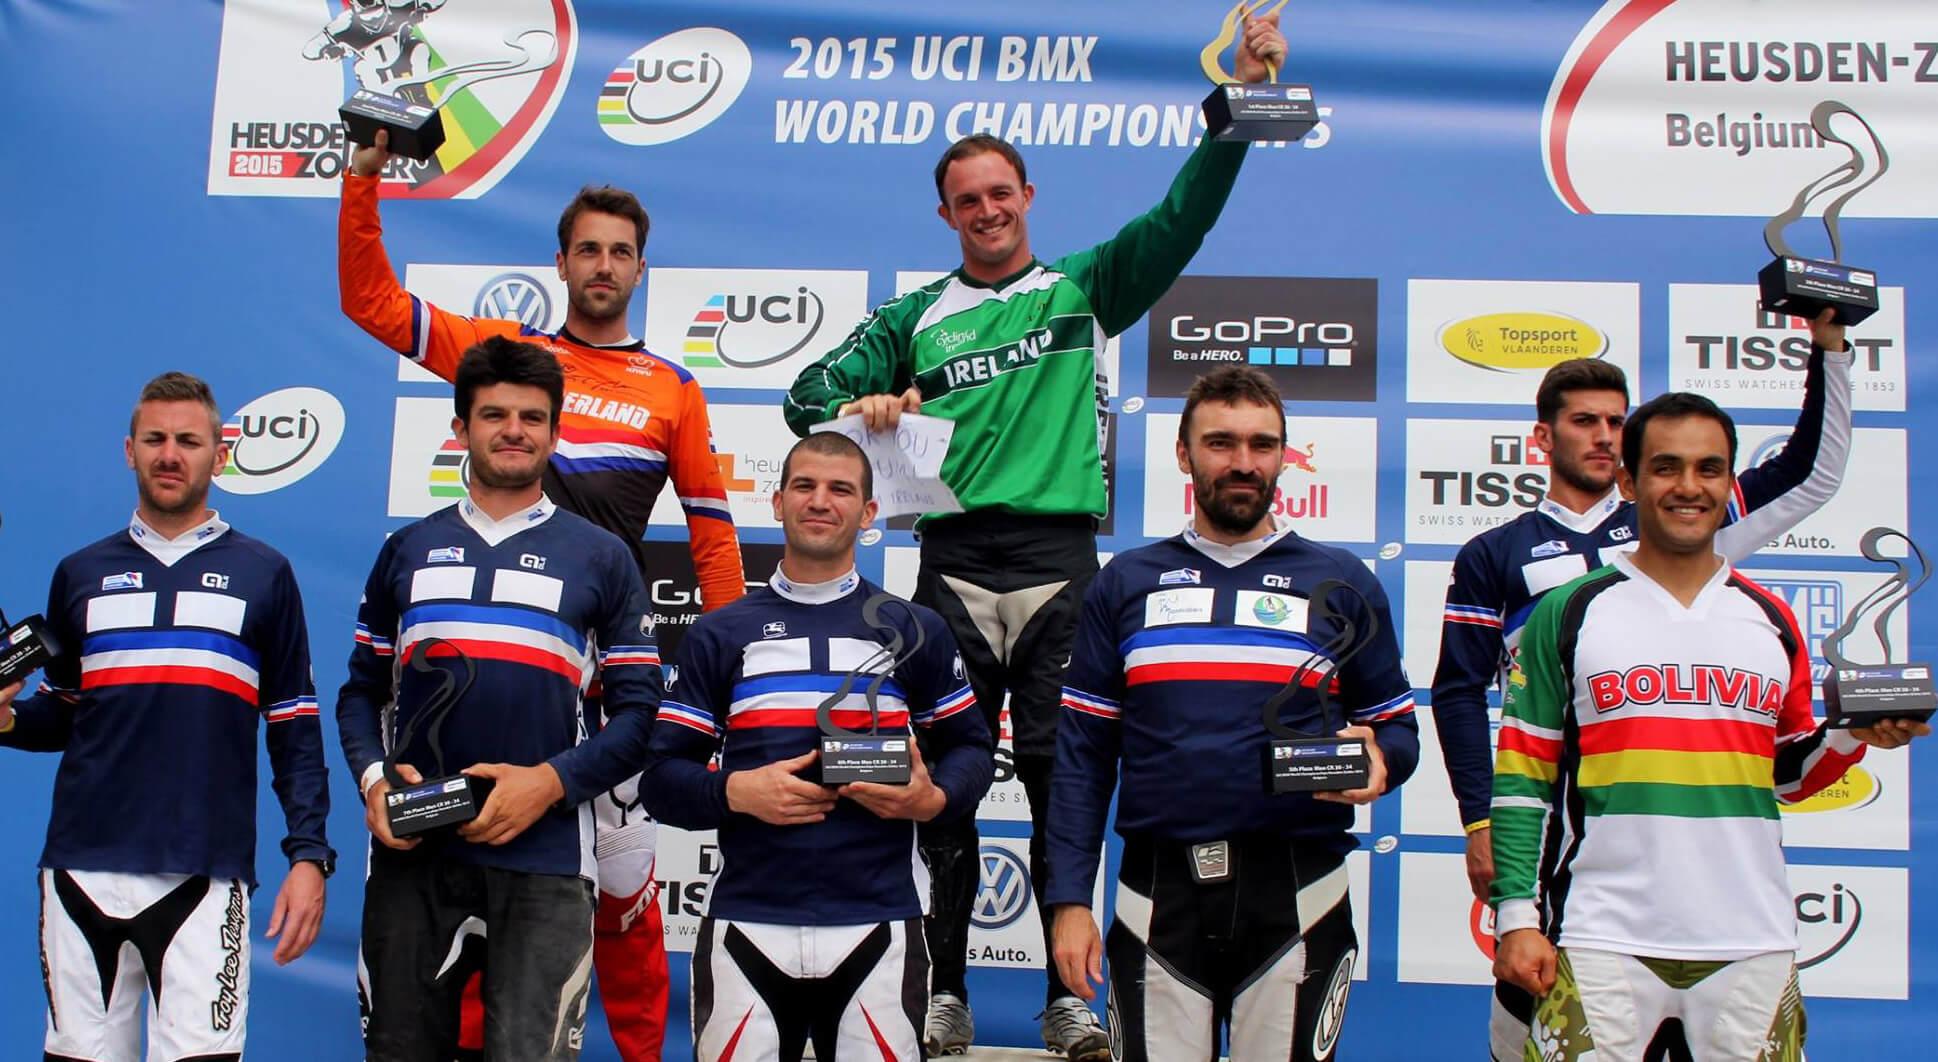 Kelvin Batey - Stichting Dutch BMX Race Squad